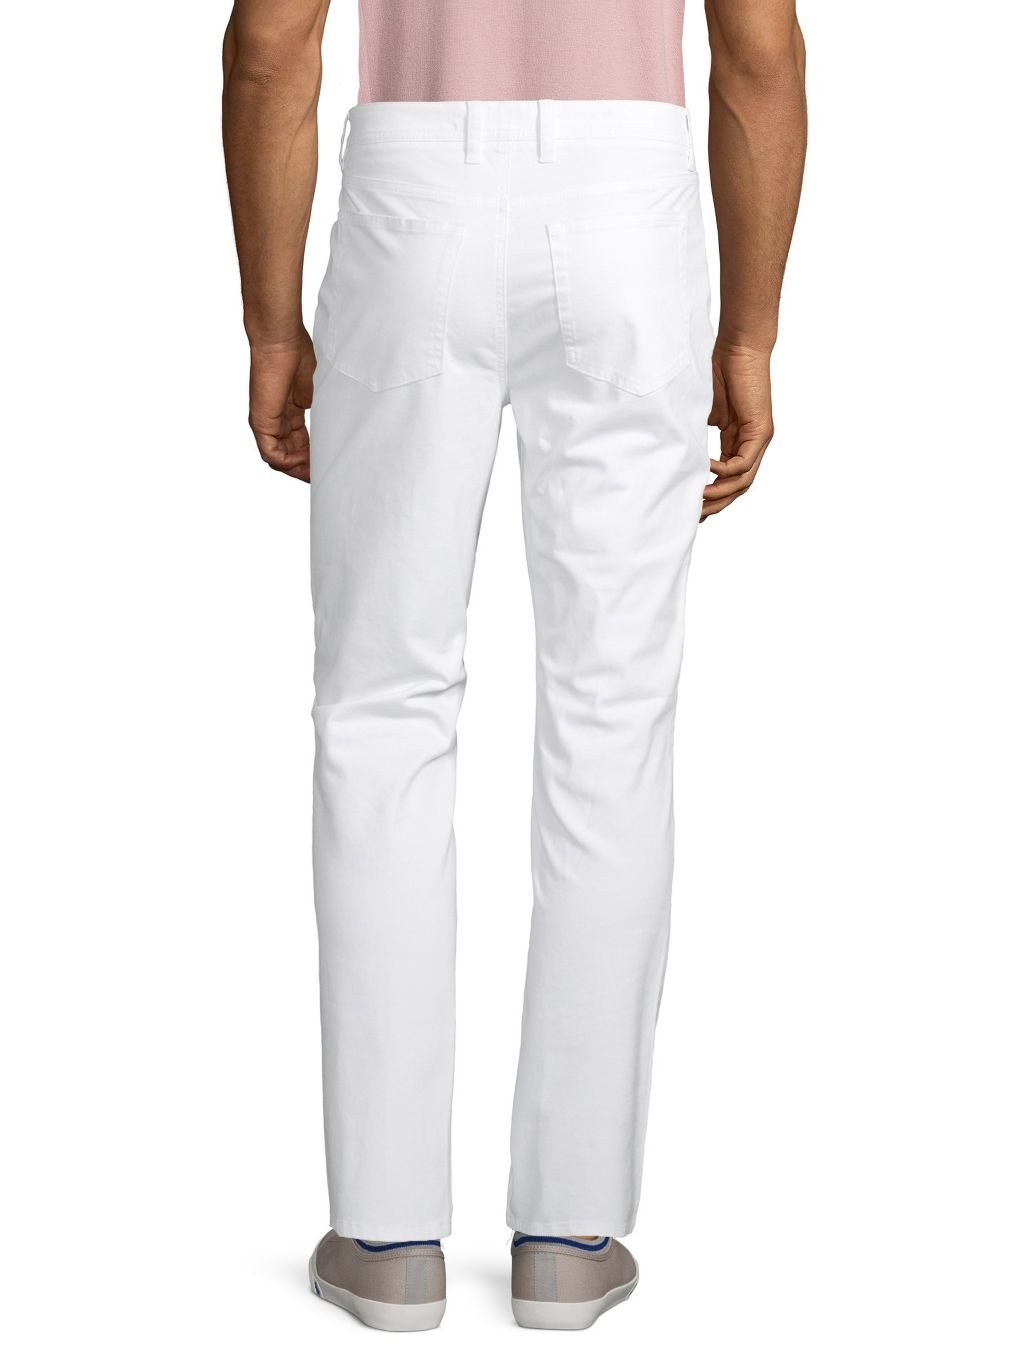 Saks Fifth Avenue Essential 5-Pocket Jeans